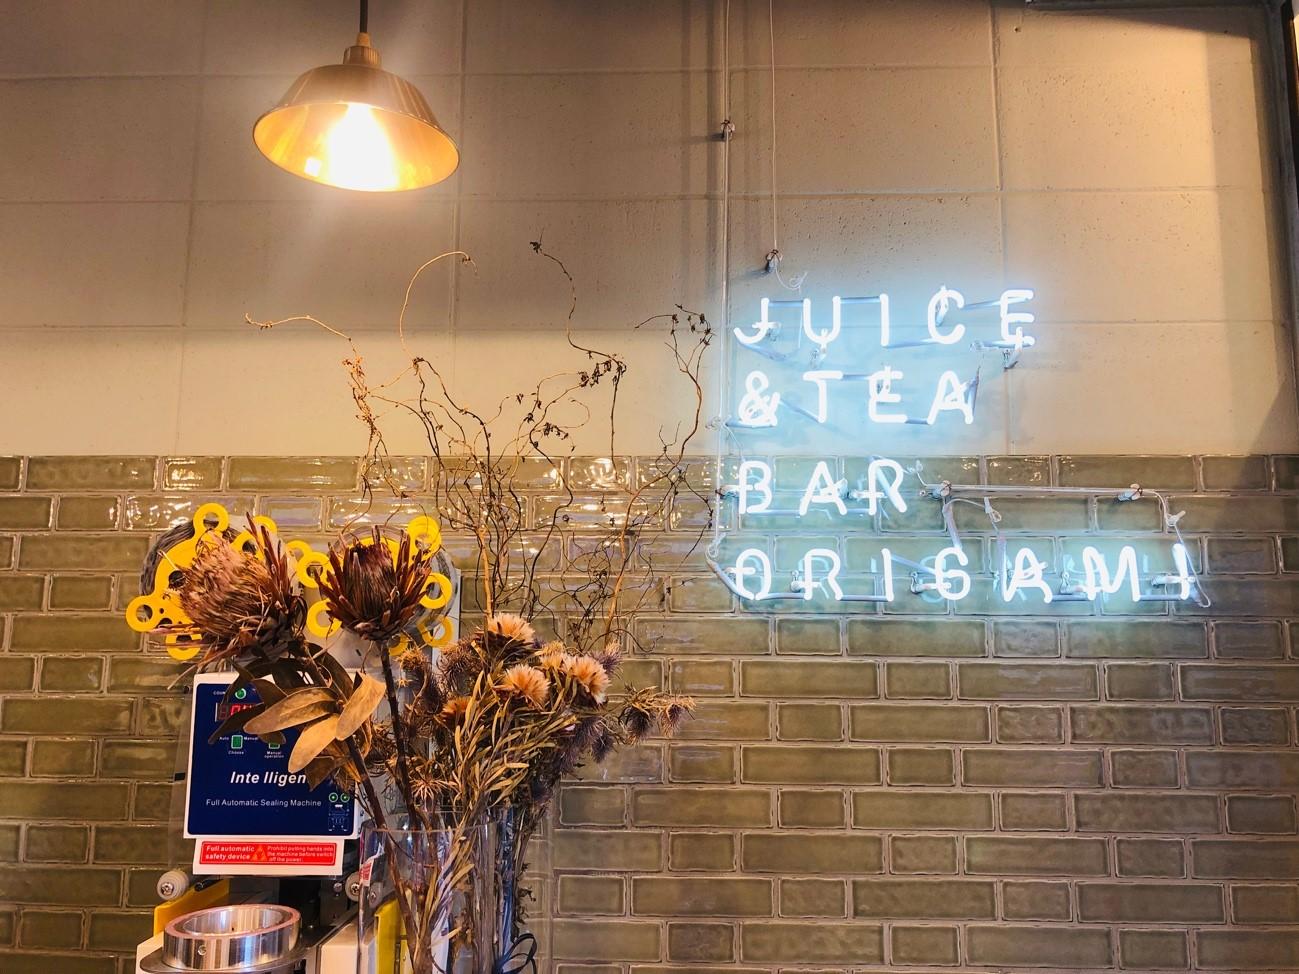 Juice & Tea Bar ORIGAMI 北谷アメリカンヴィレッジ店の店内